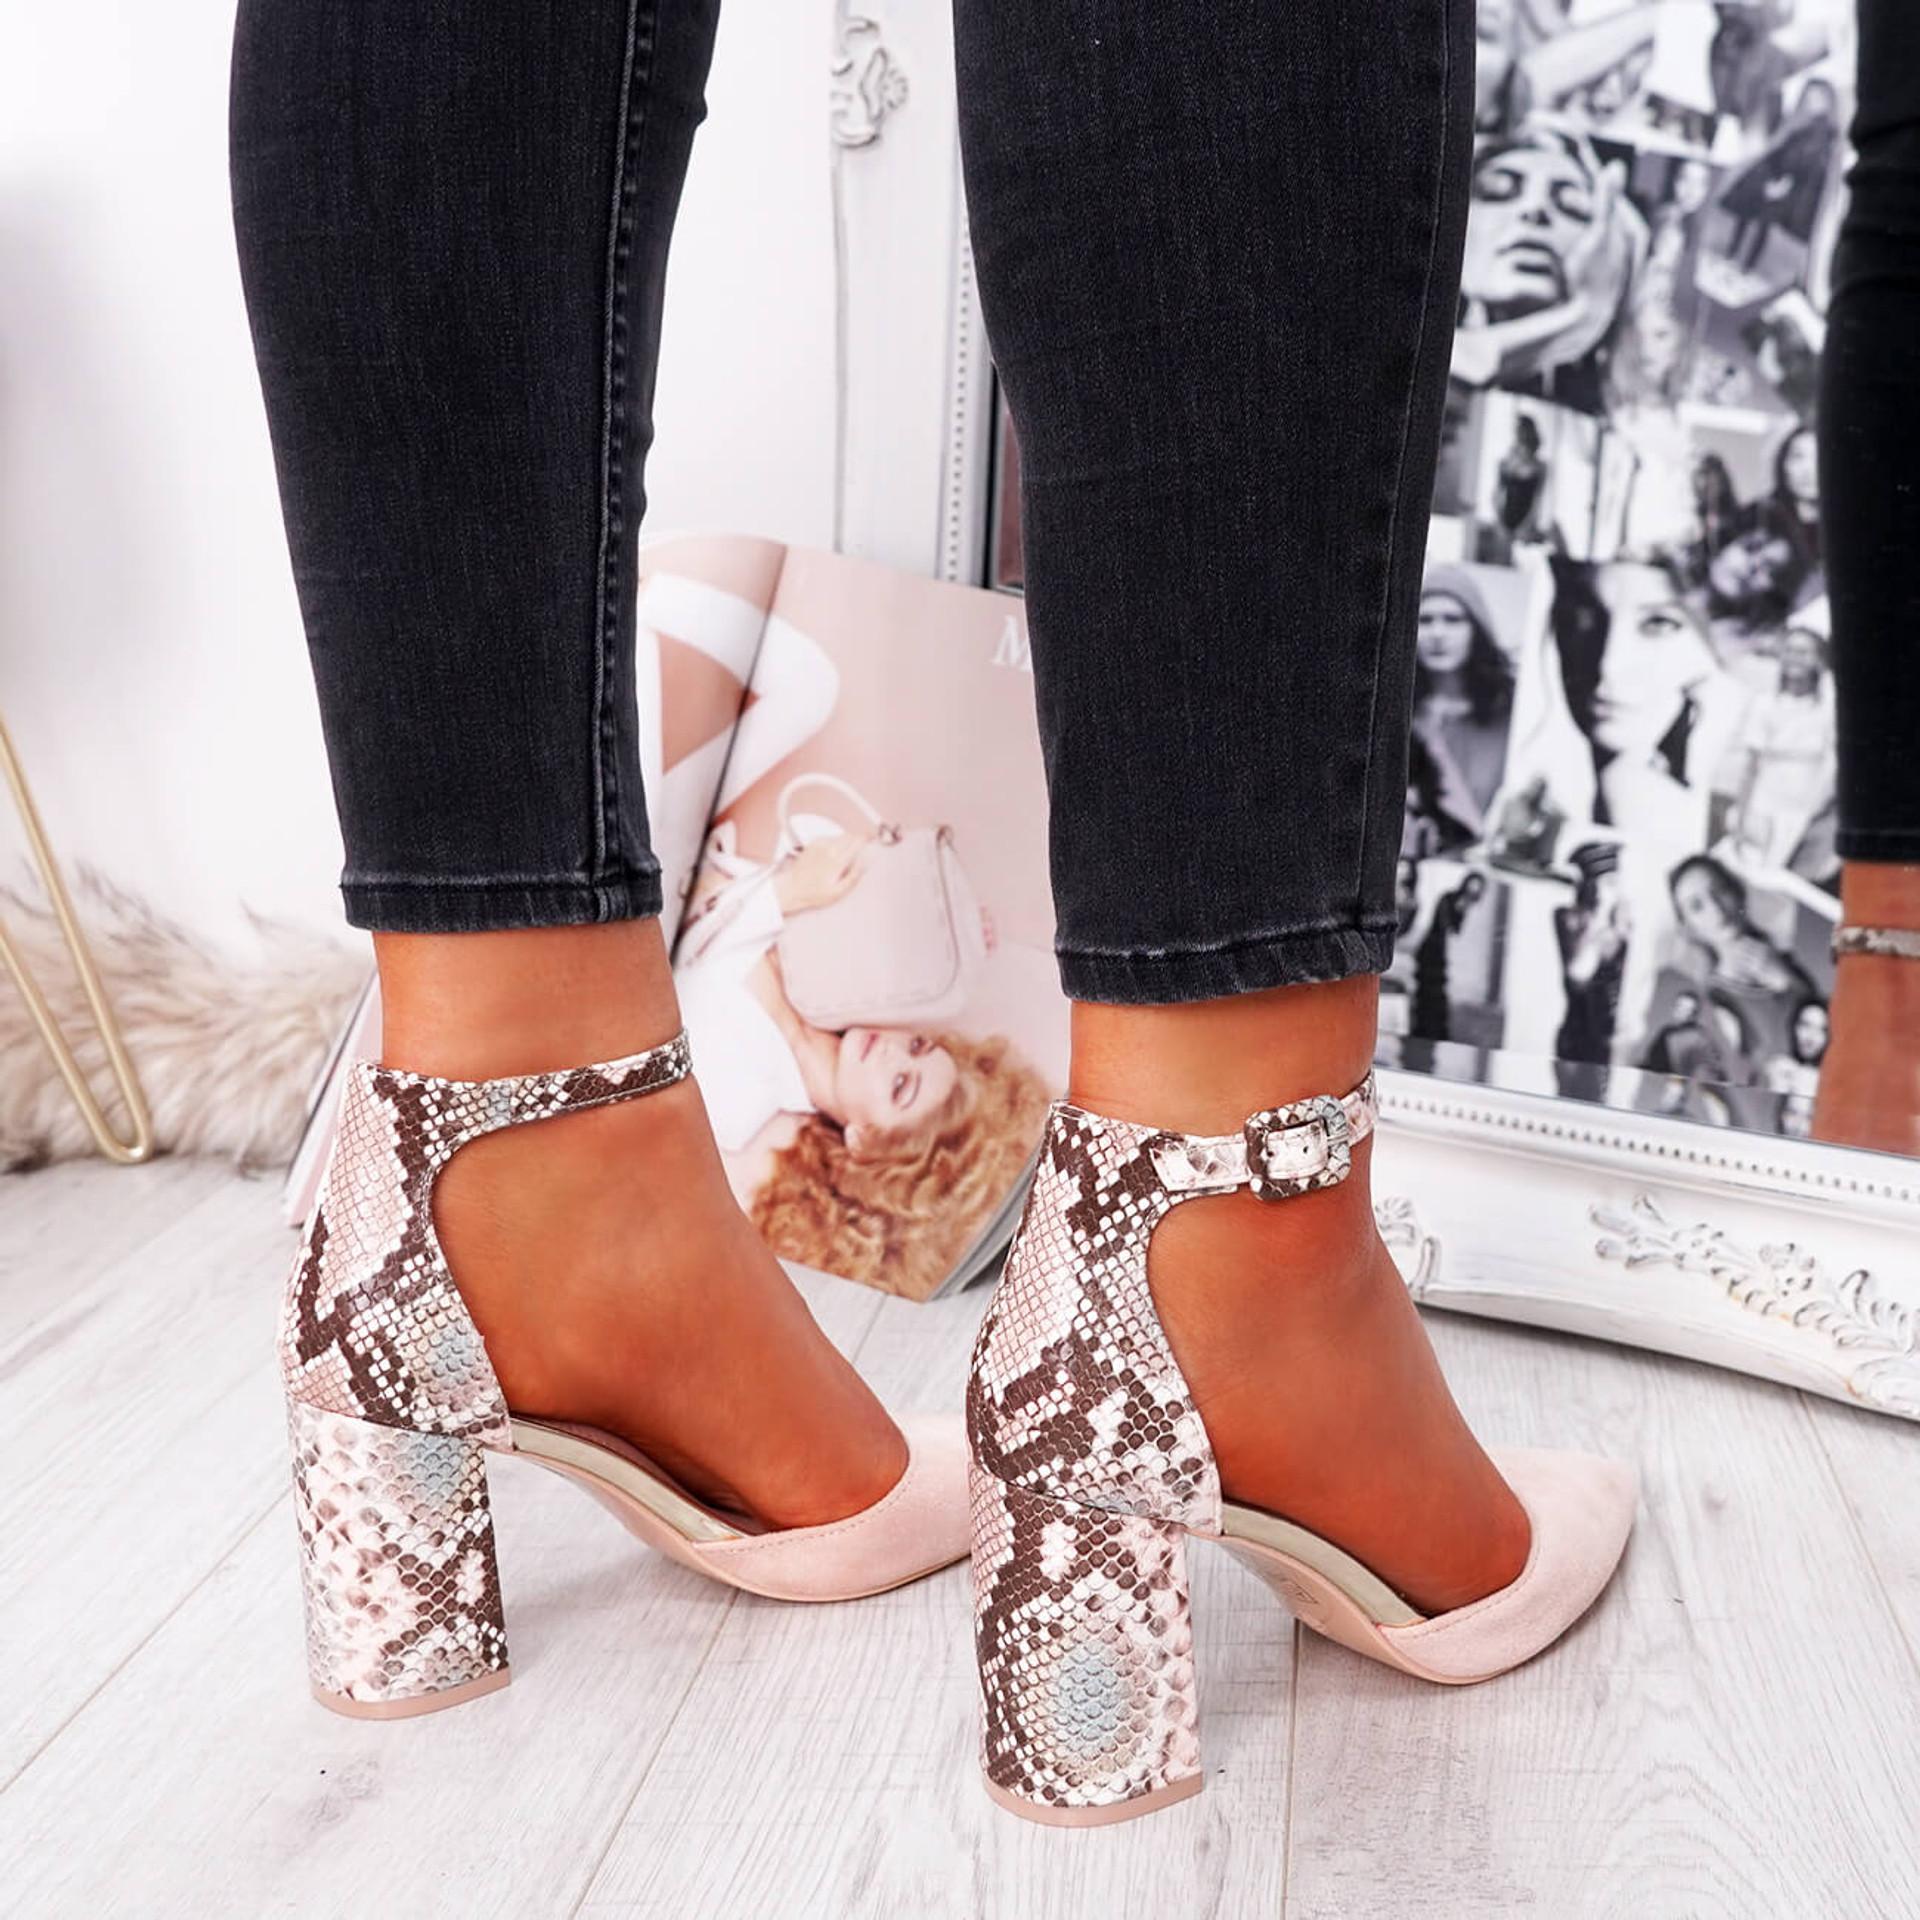 Nude snake pattern block heel pumps for womens size uk 3 4 5 6 7 8